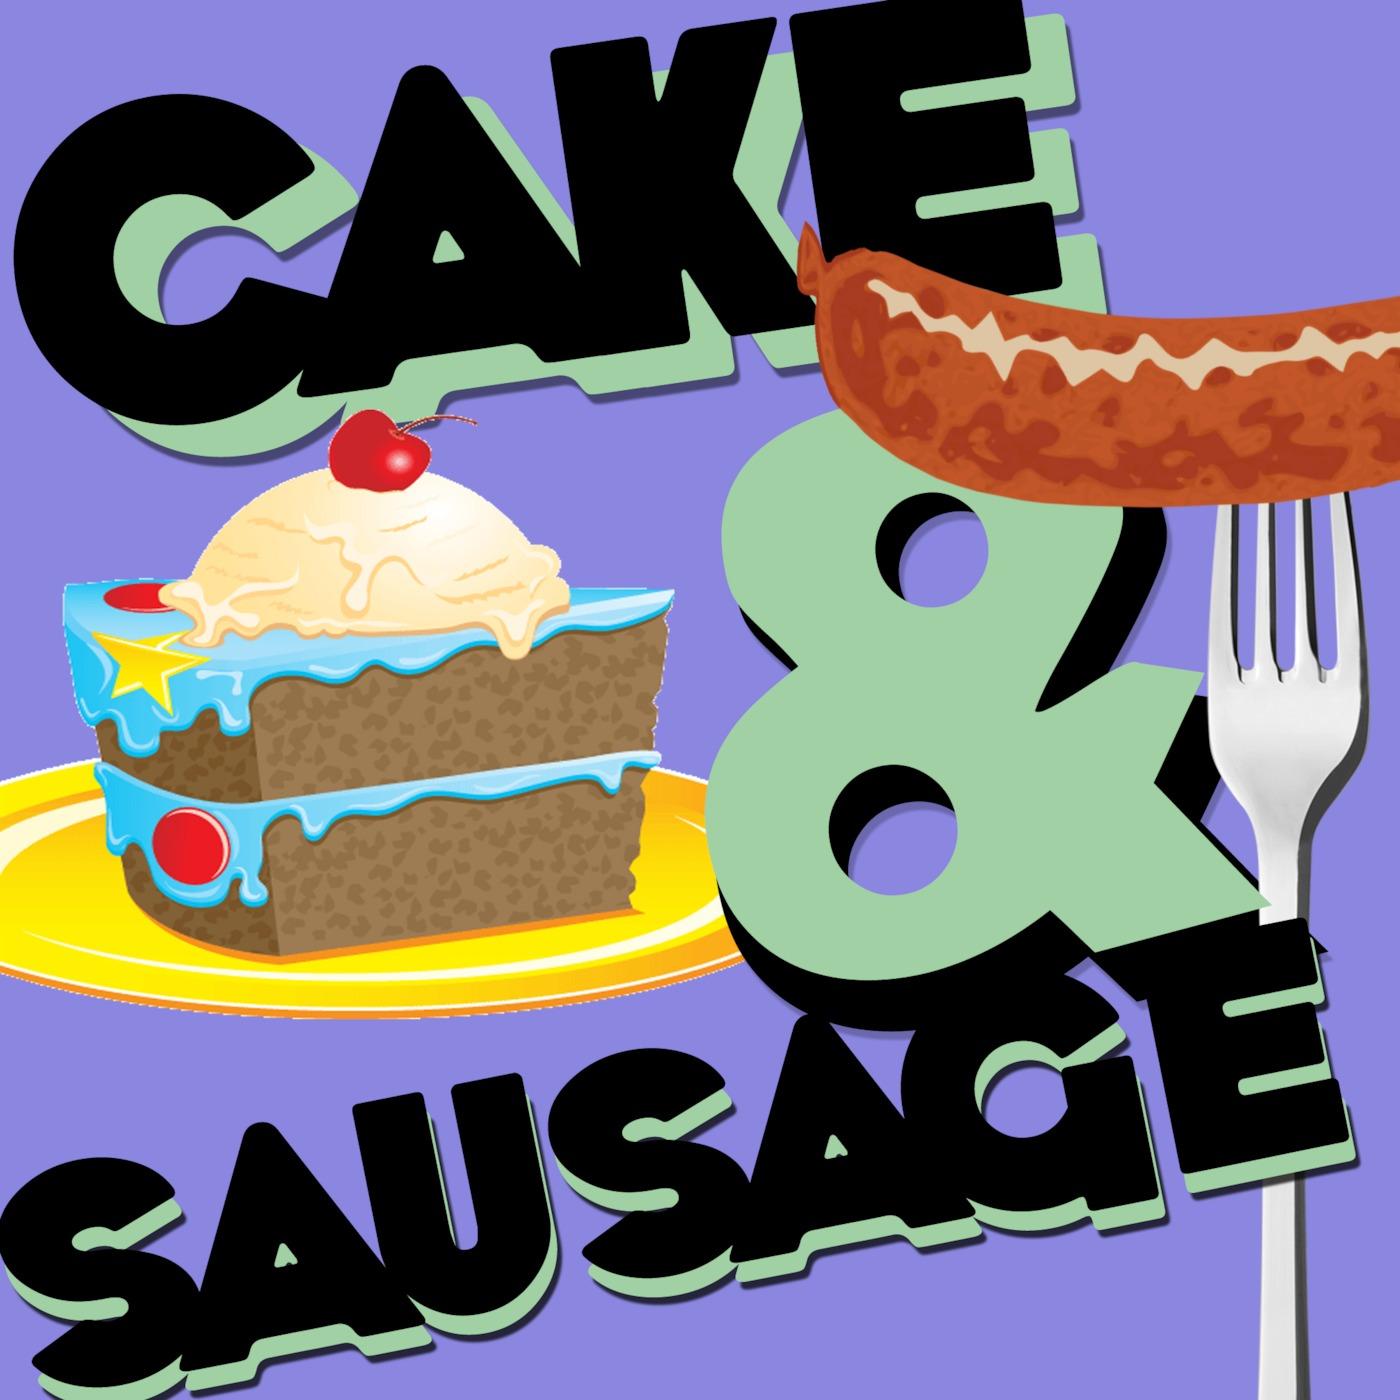 Cake And Sausage